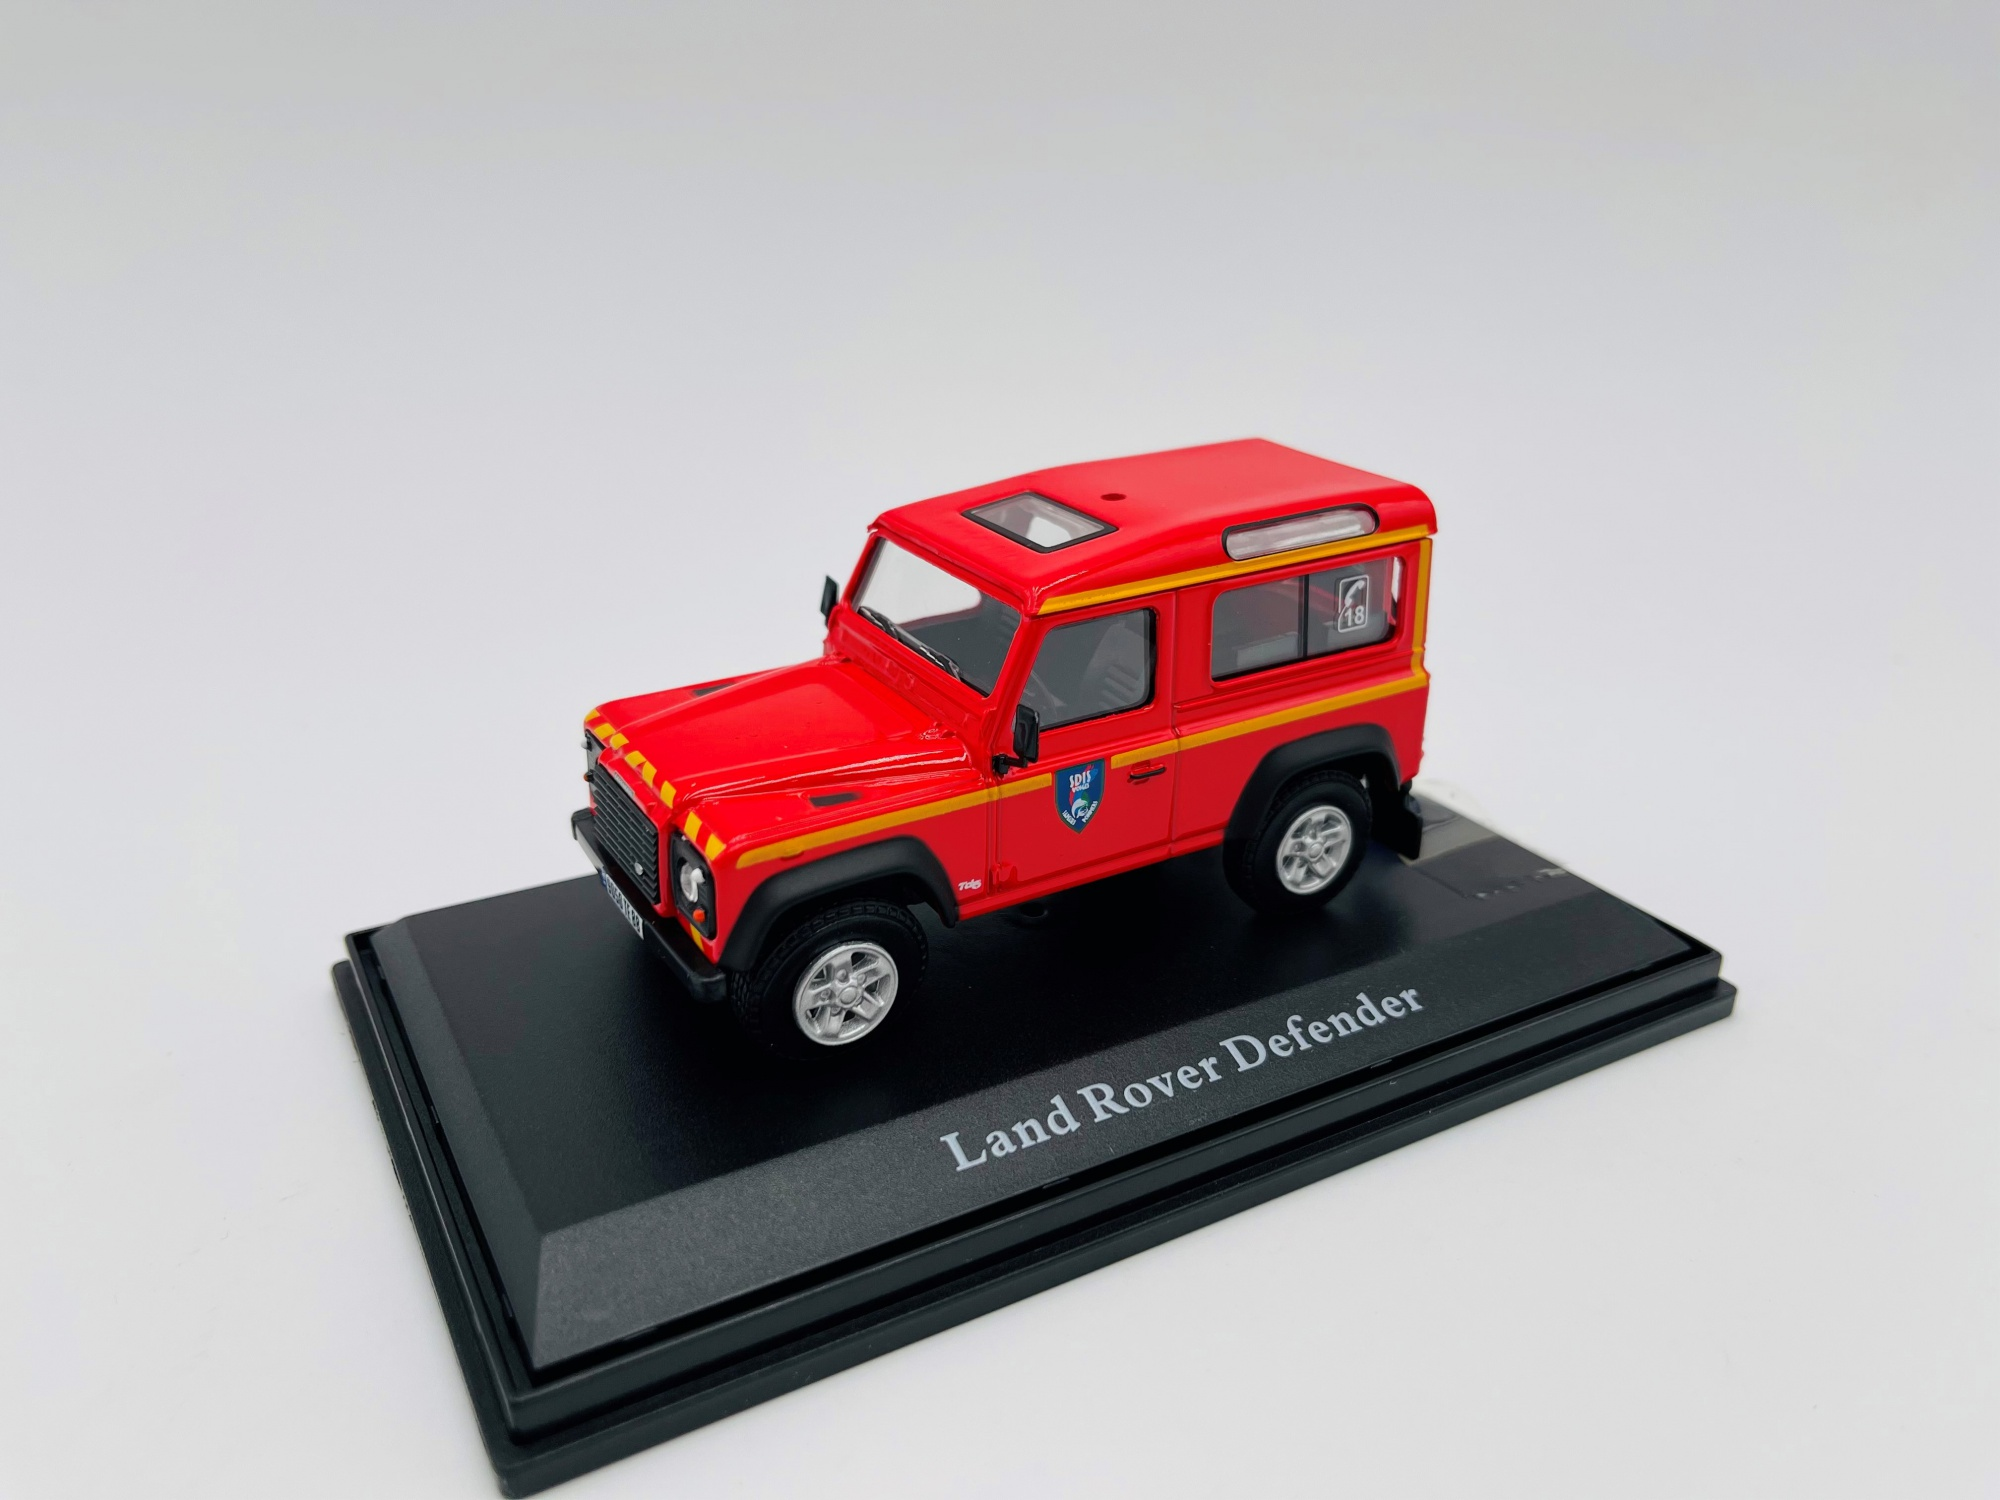 Land Rover Defender 90 SDIS 88